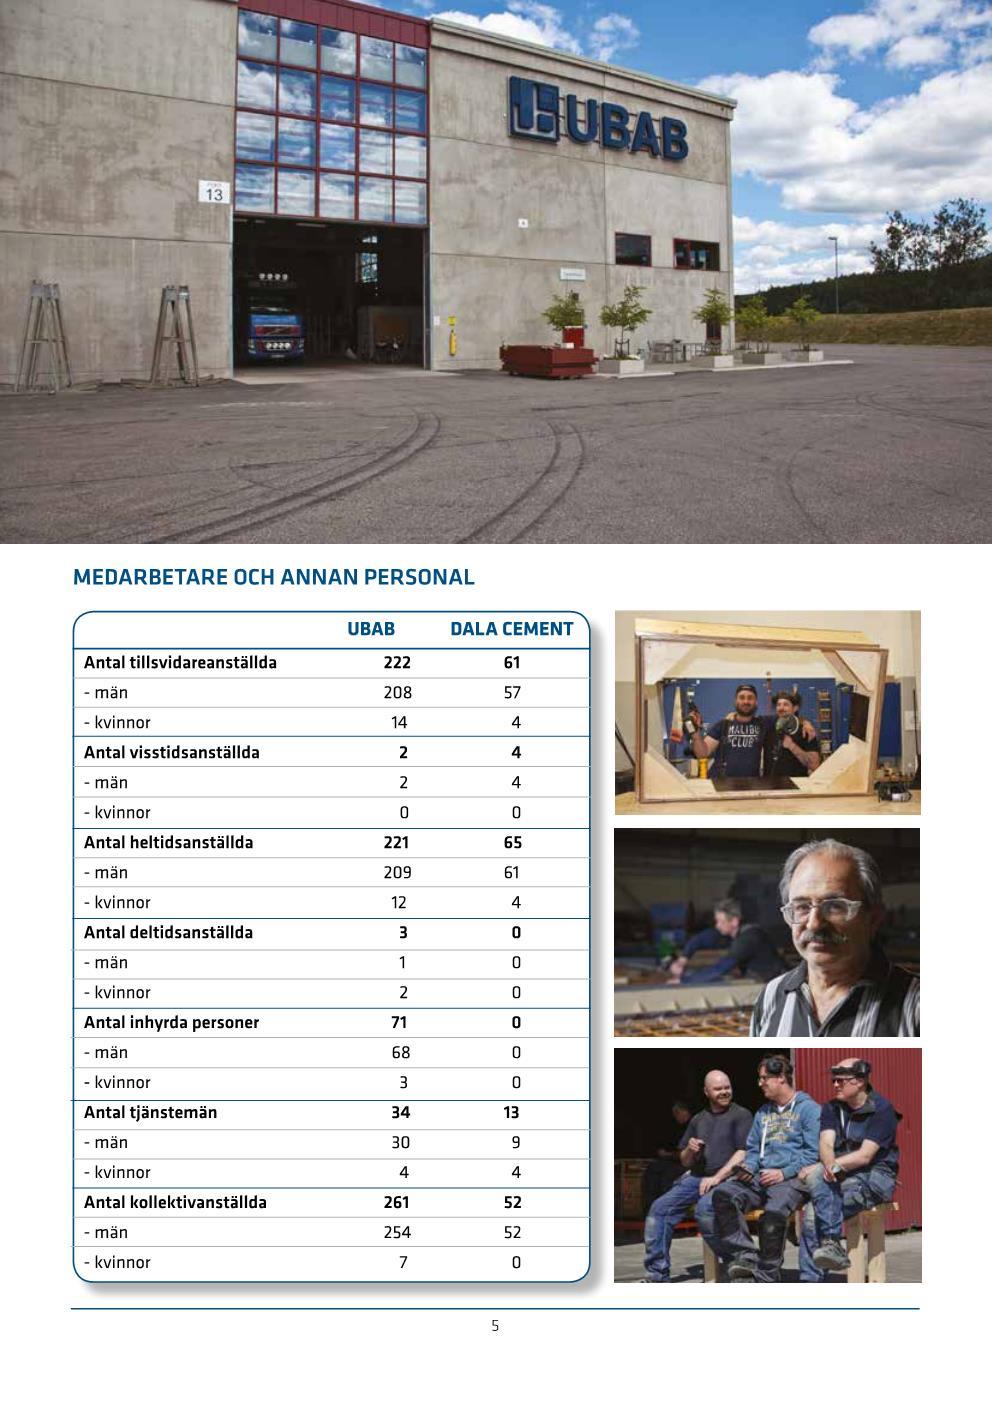 UBAB Hållbarhetsredovisning 2018_webres Sida 005